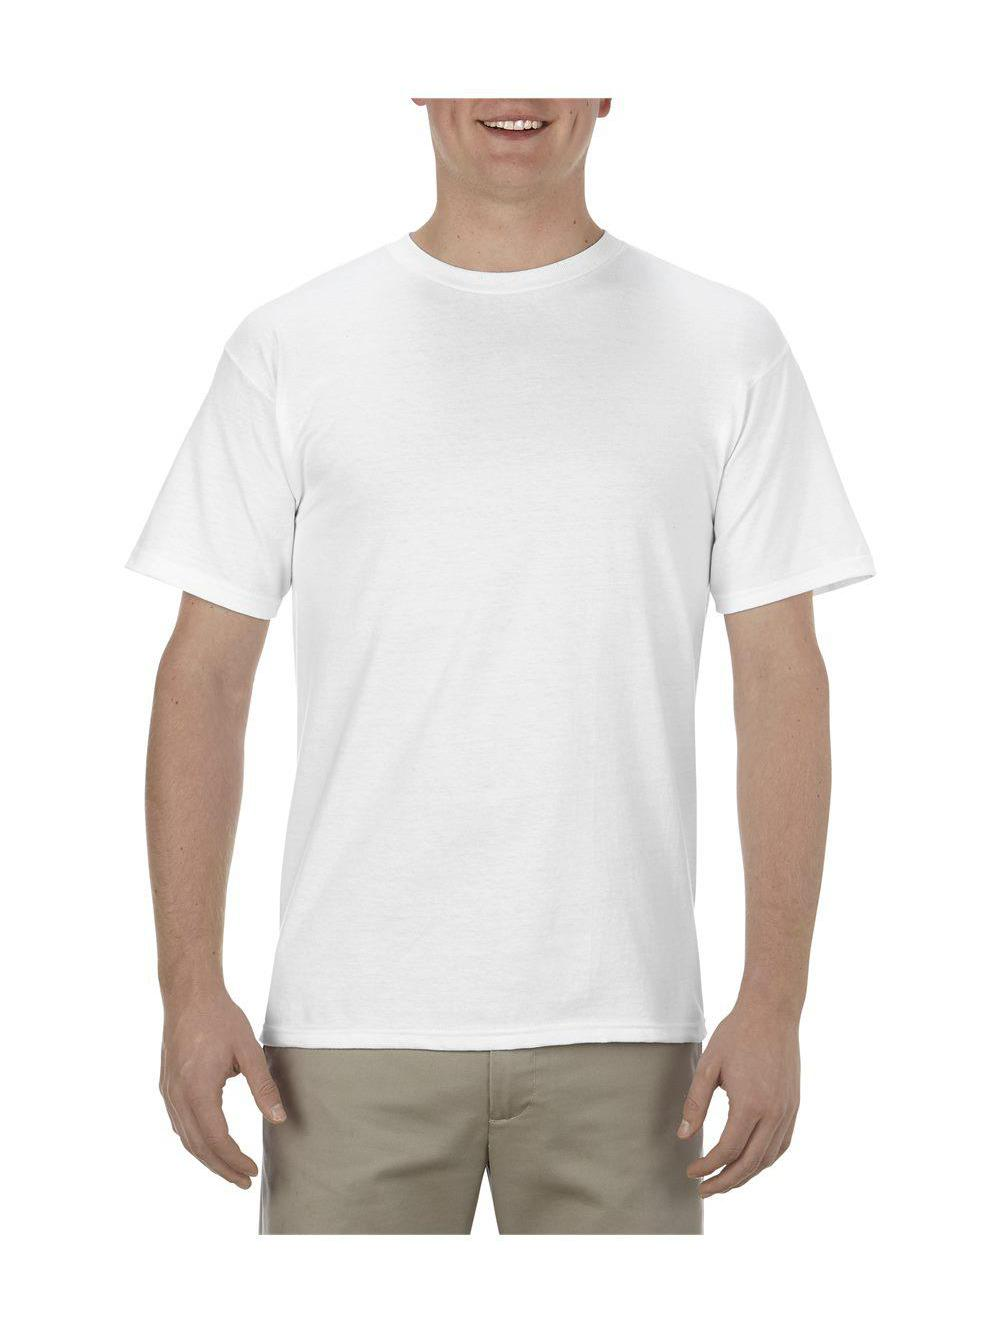 ALSTYLE-Premium-T-Shirt-1701 thumbnail 70